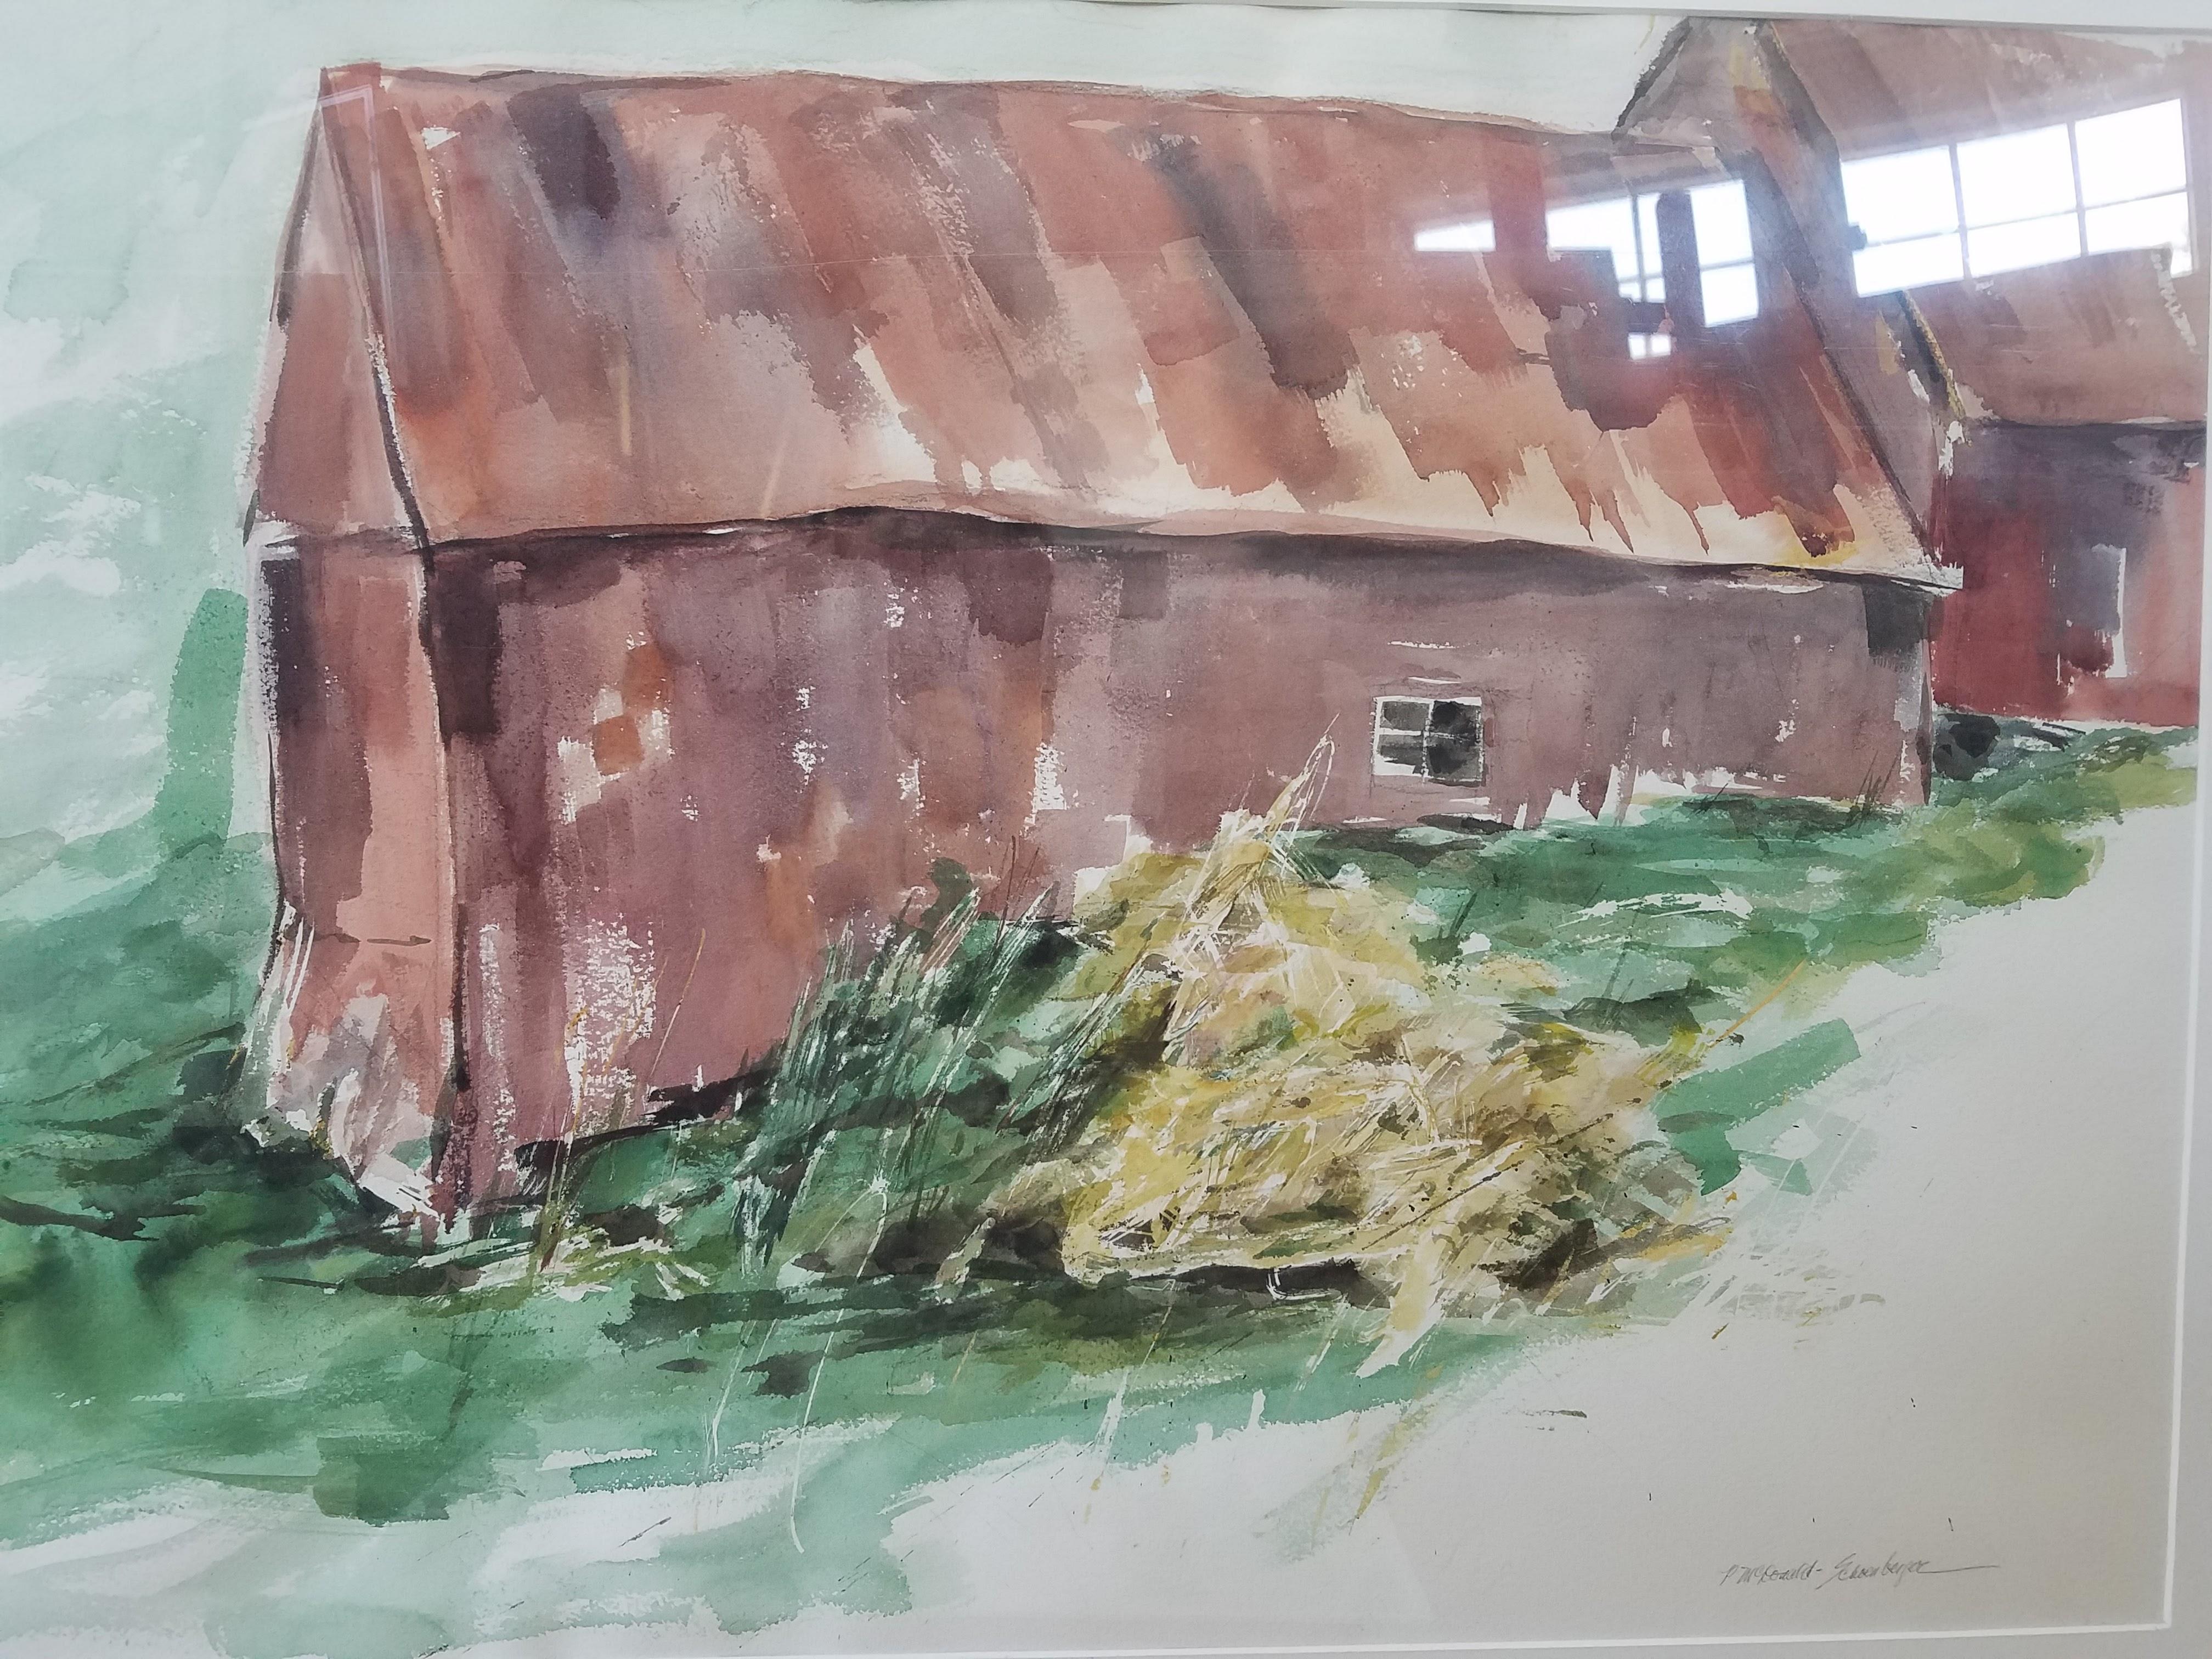 20) Red Barn